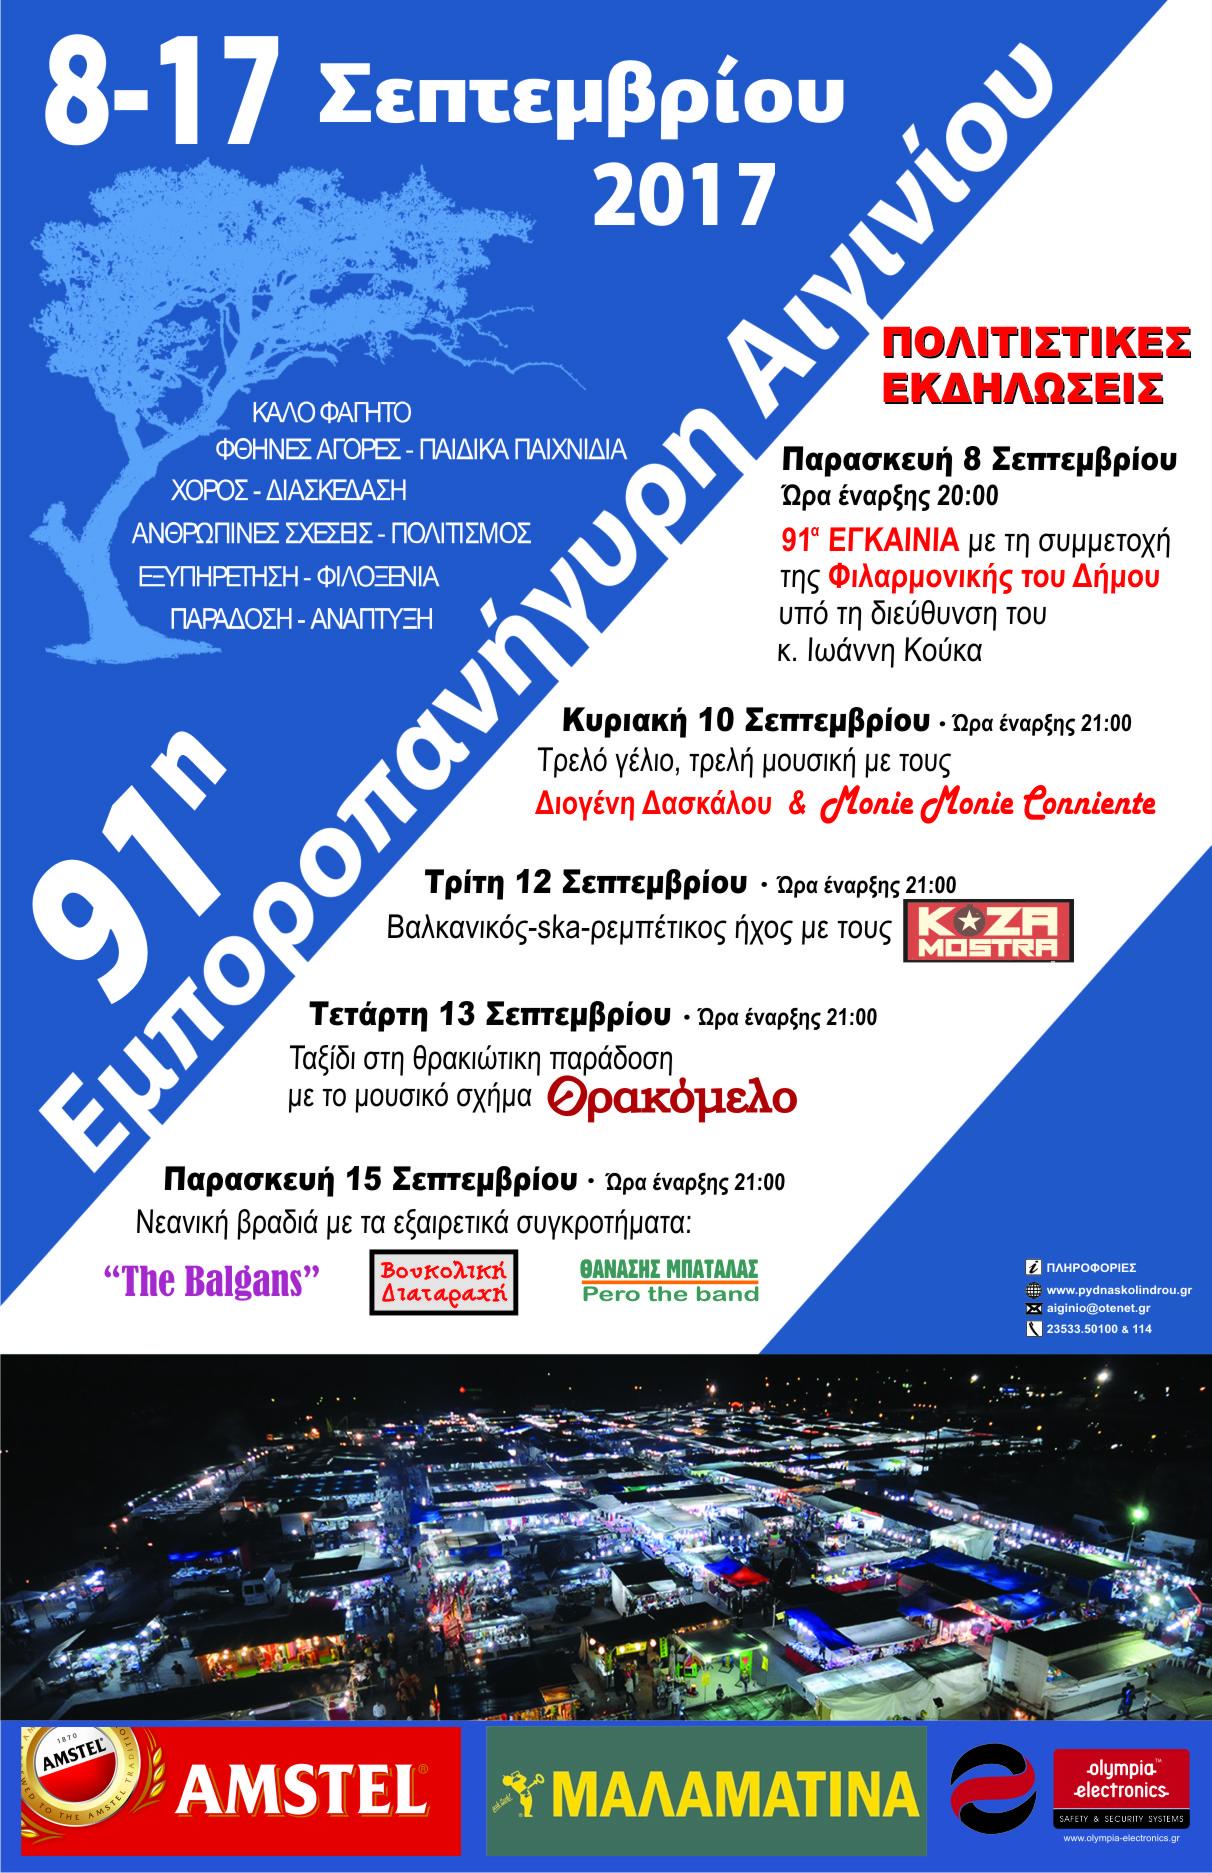 http://www.pydnaskolindrou.gr/sites/default/files/afisa_emporopanigyri_2017_1.jpg